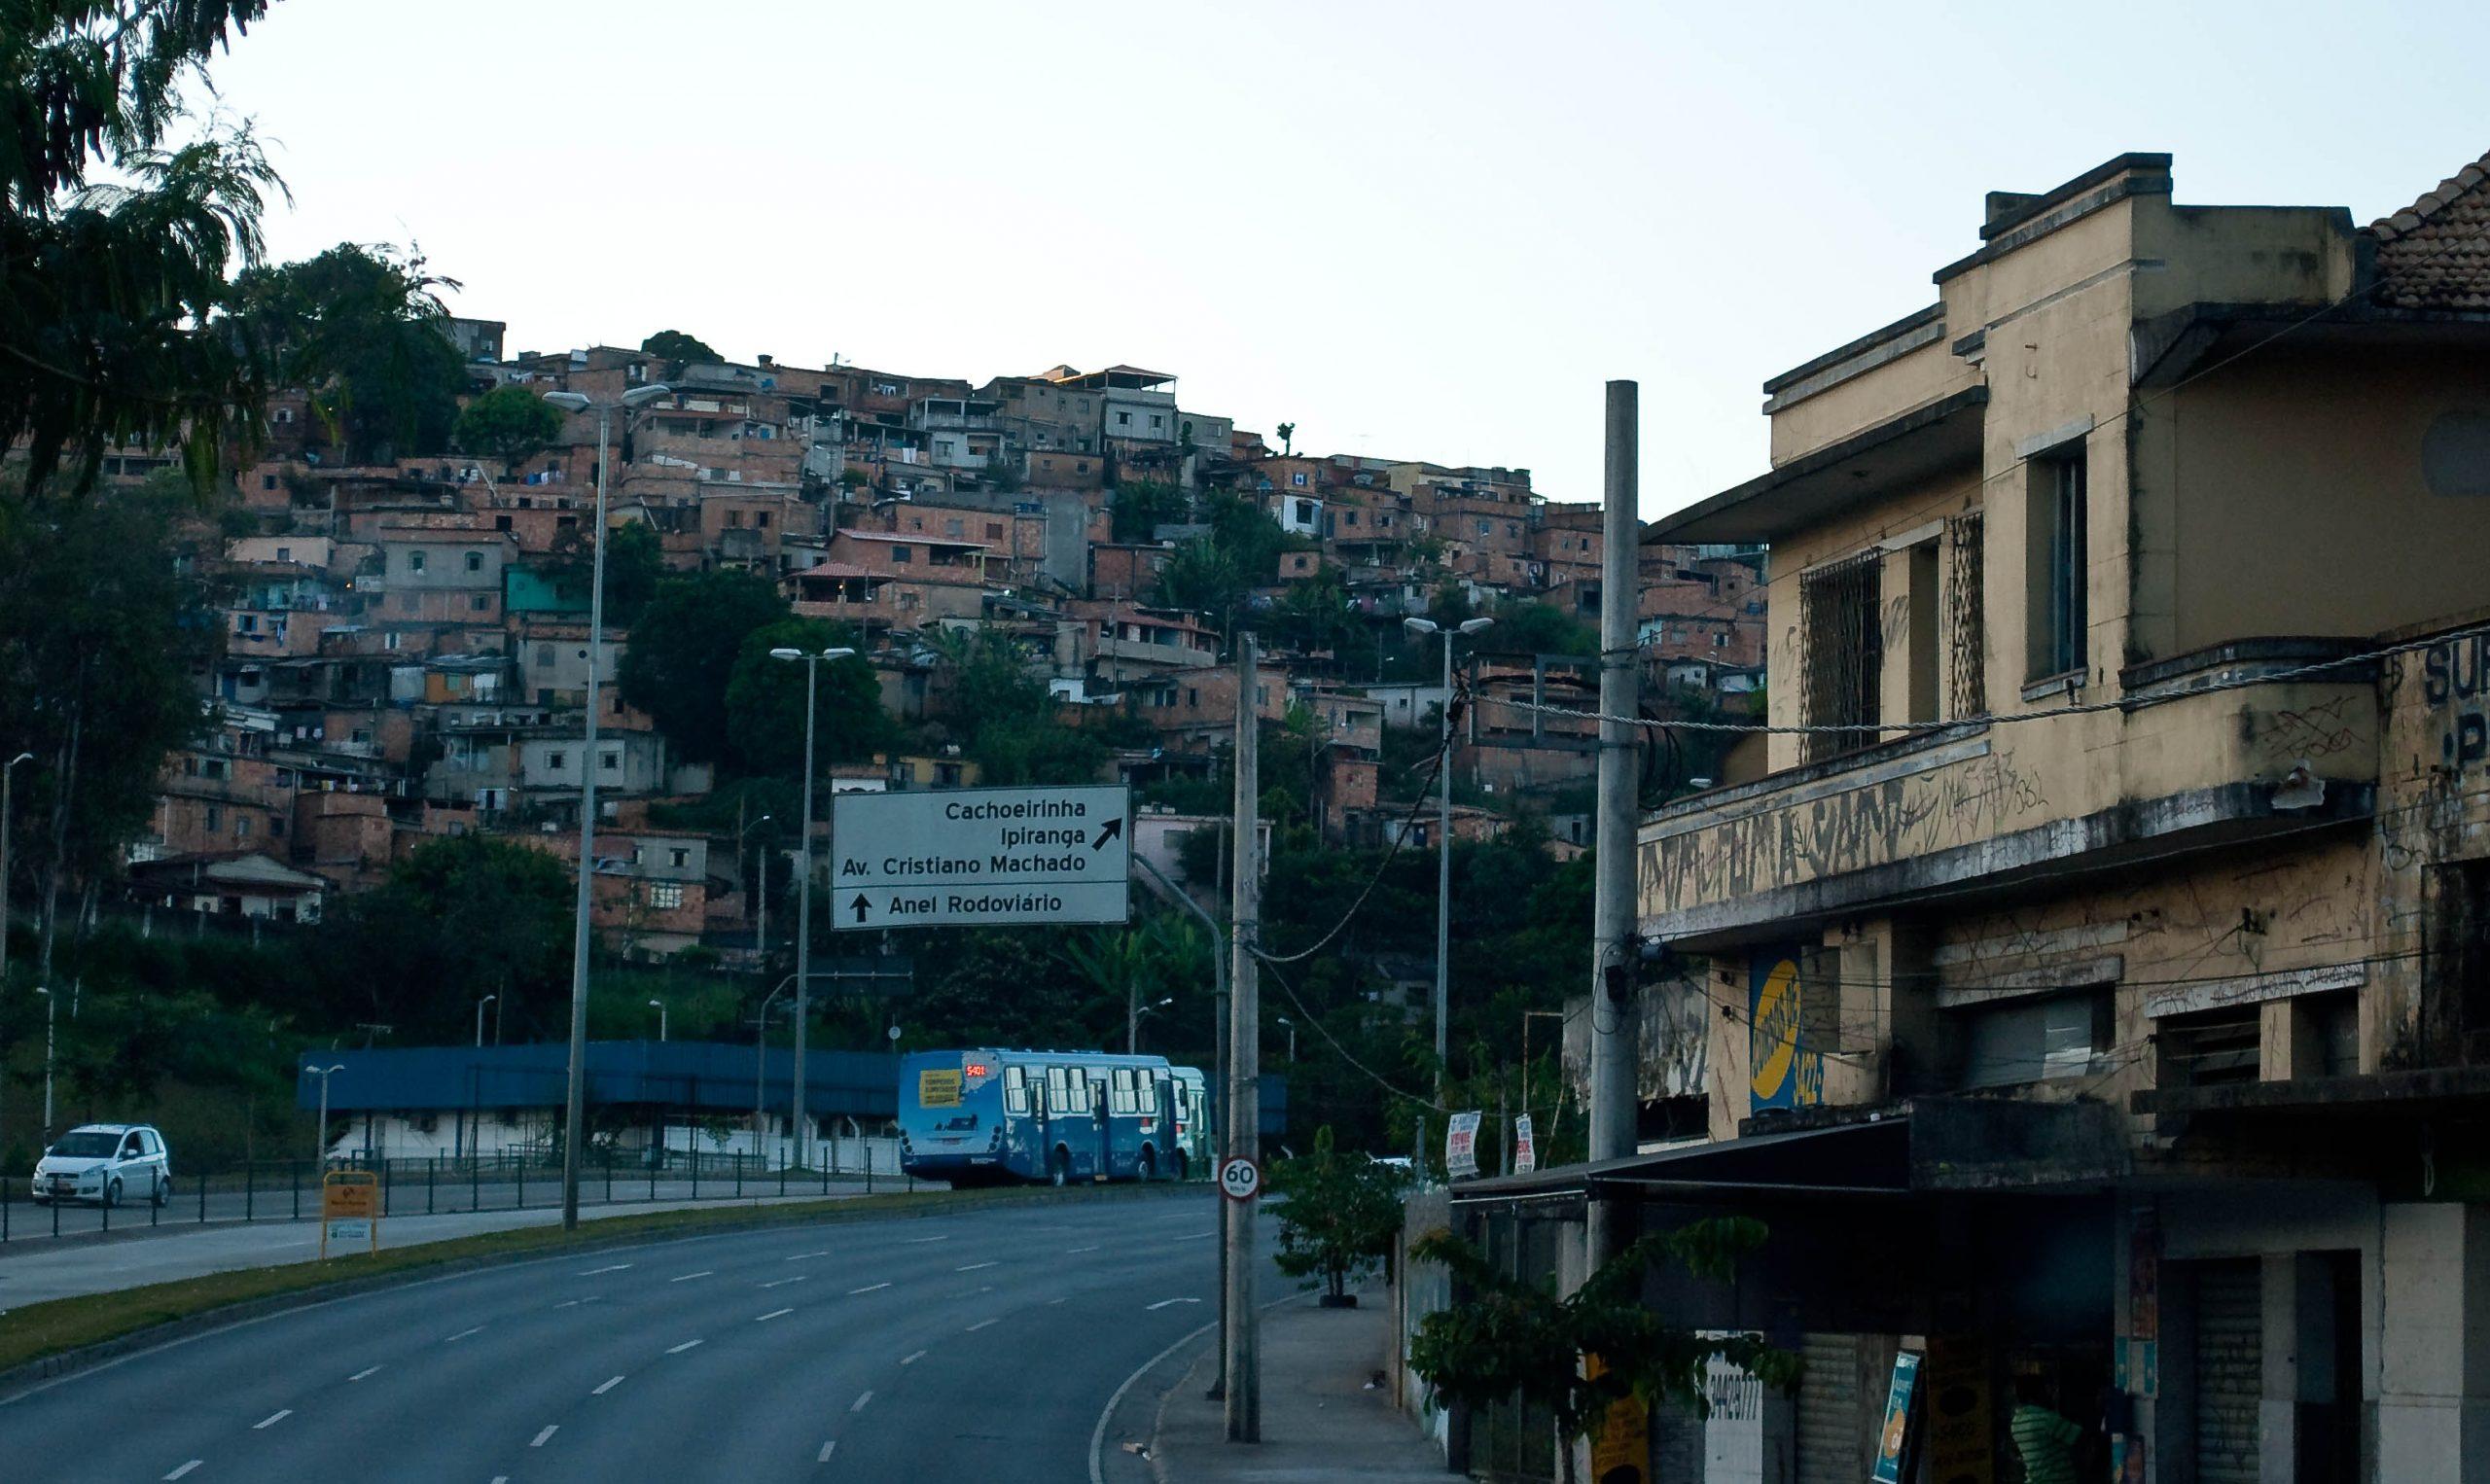 Promoting enterprise in Belo Horizonte